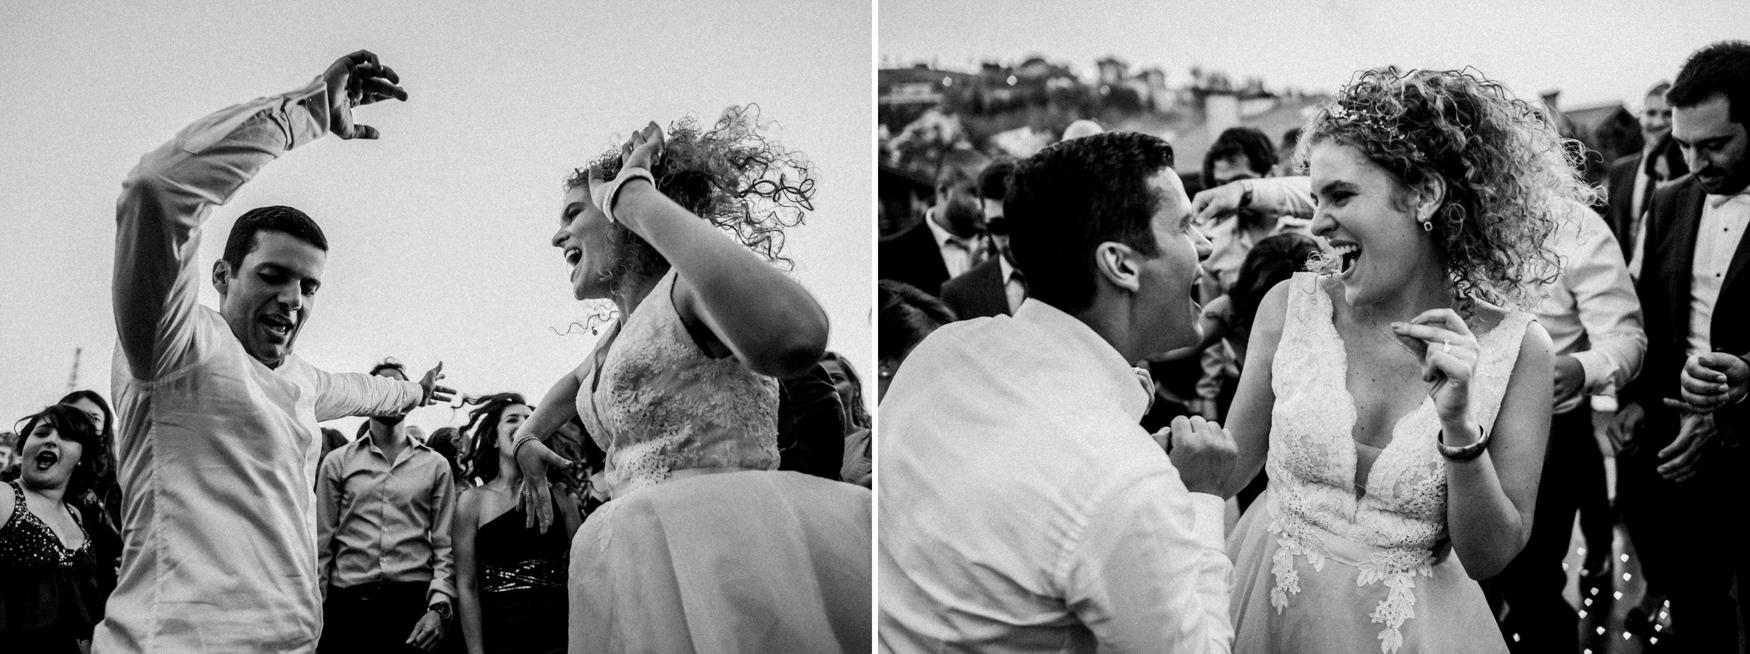 LR5 beirut lebanon mzaar intercontinental wedding photographer 023.jpg